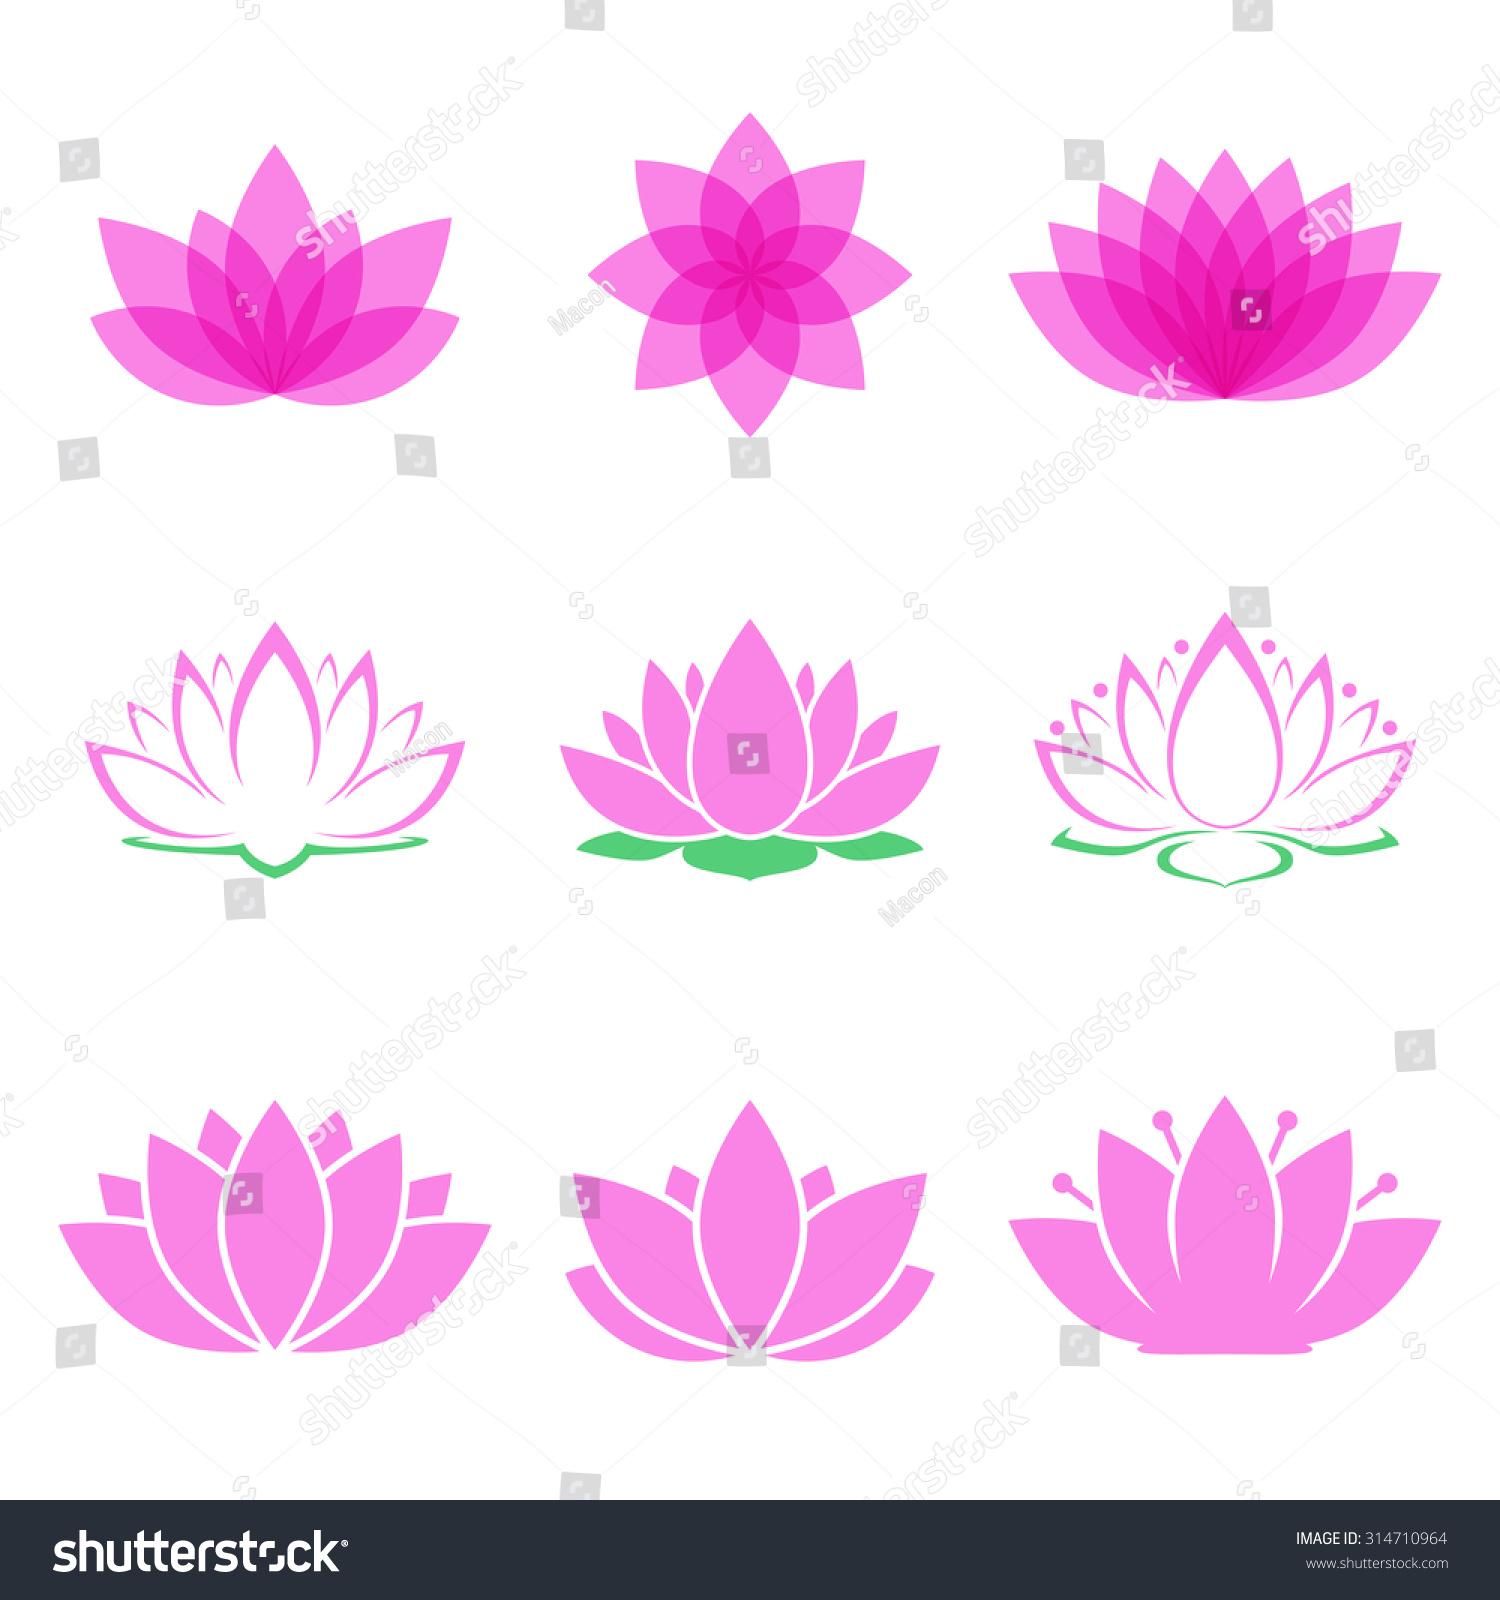 Royalty free lotus flower set lotus symbol or icon 314710964 lotus flower set lotus symbol or icon for spa salon yoga class or wellness izmirmasajfo